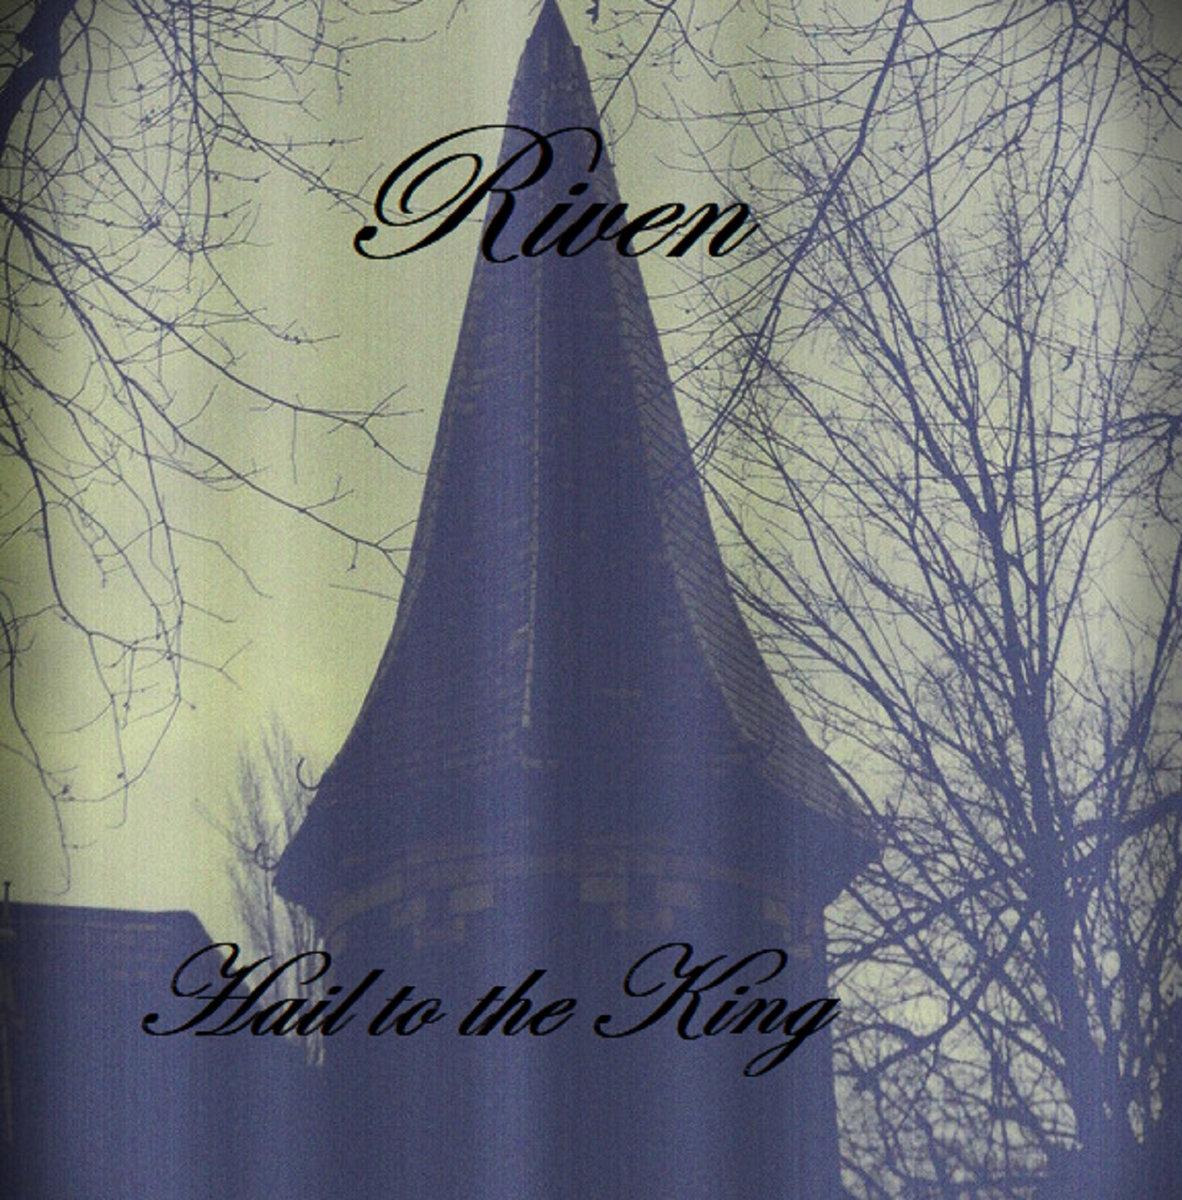 INTERVIEW WITH RIVEN (FUNERAL DOOM METAL)